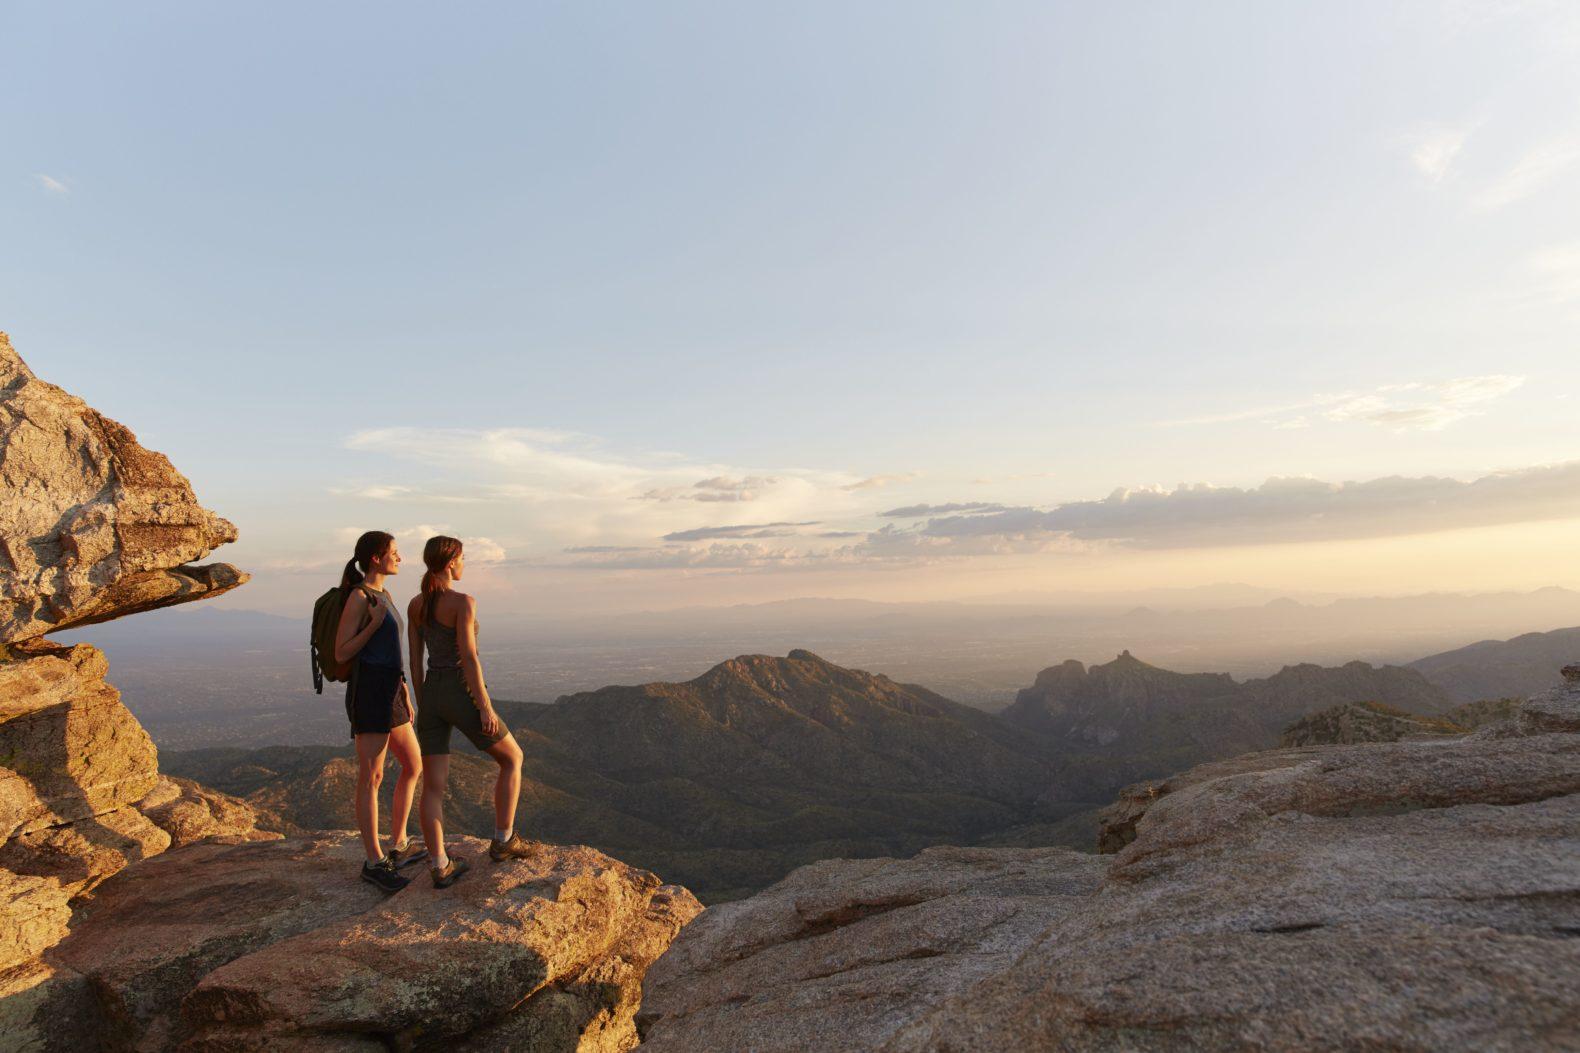 two-females-hiking-sunset-canyon-ranch-wellness-resort-tucson-arizona-usa